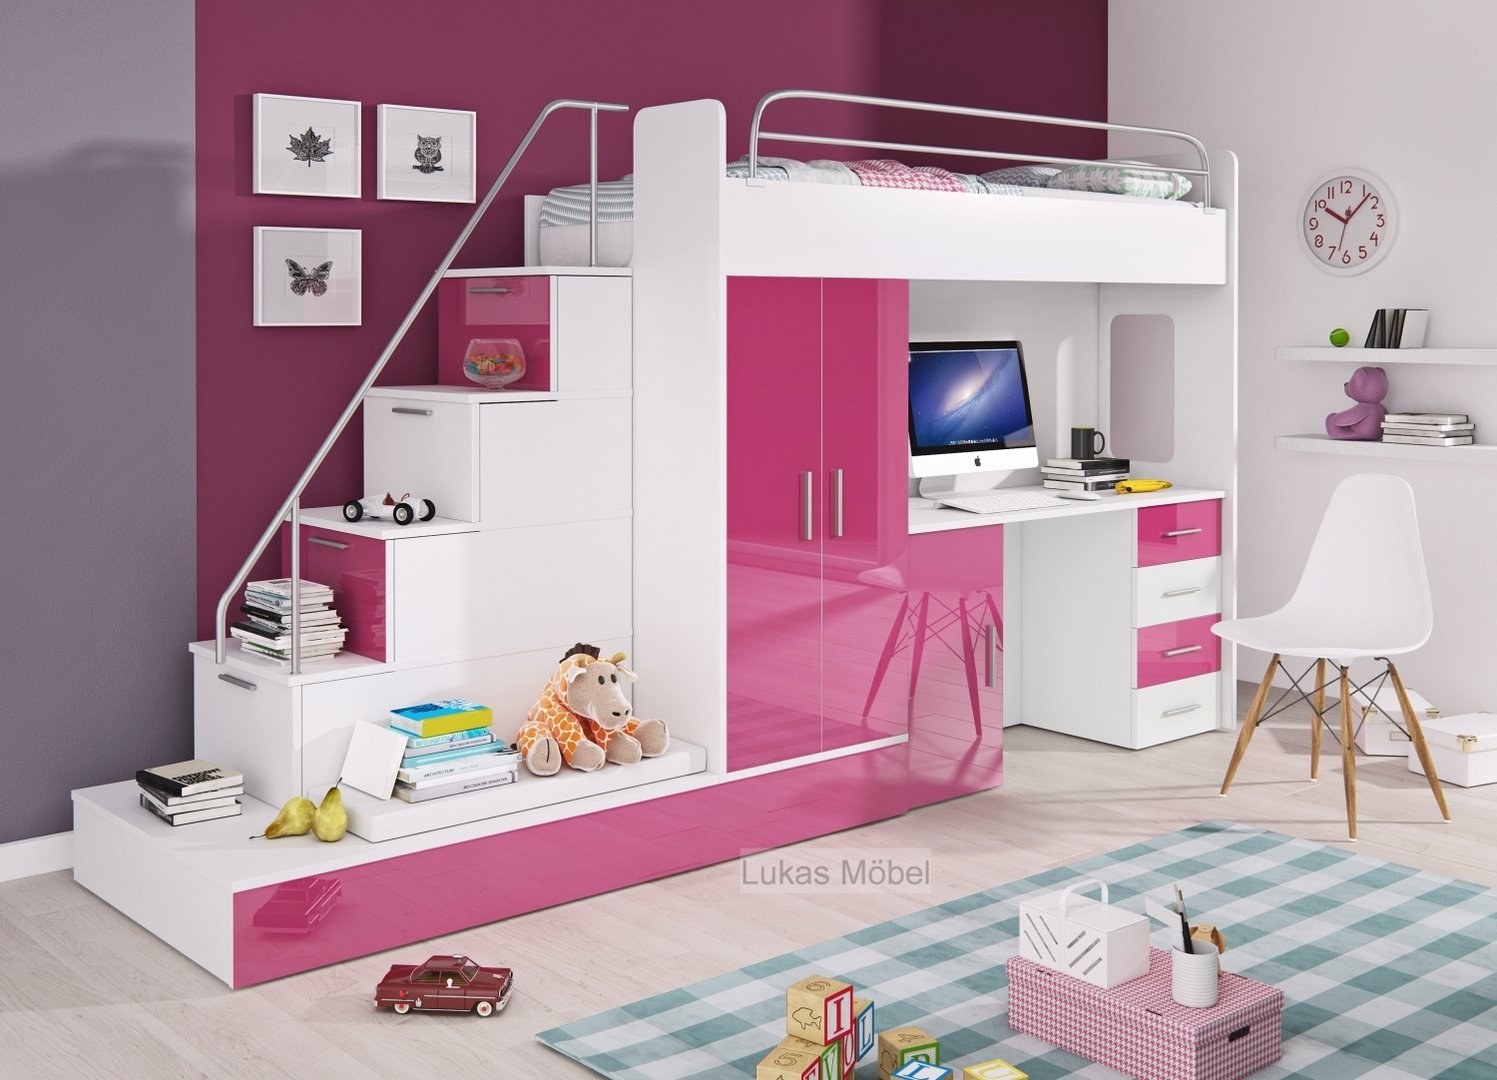 hochglanz etagenbett hochbett felix. Black Bedroom Furniture Sets. Home Design Ideas